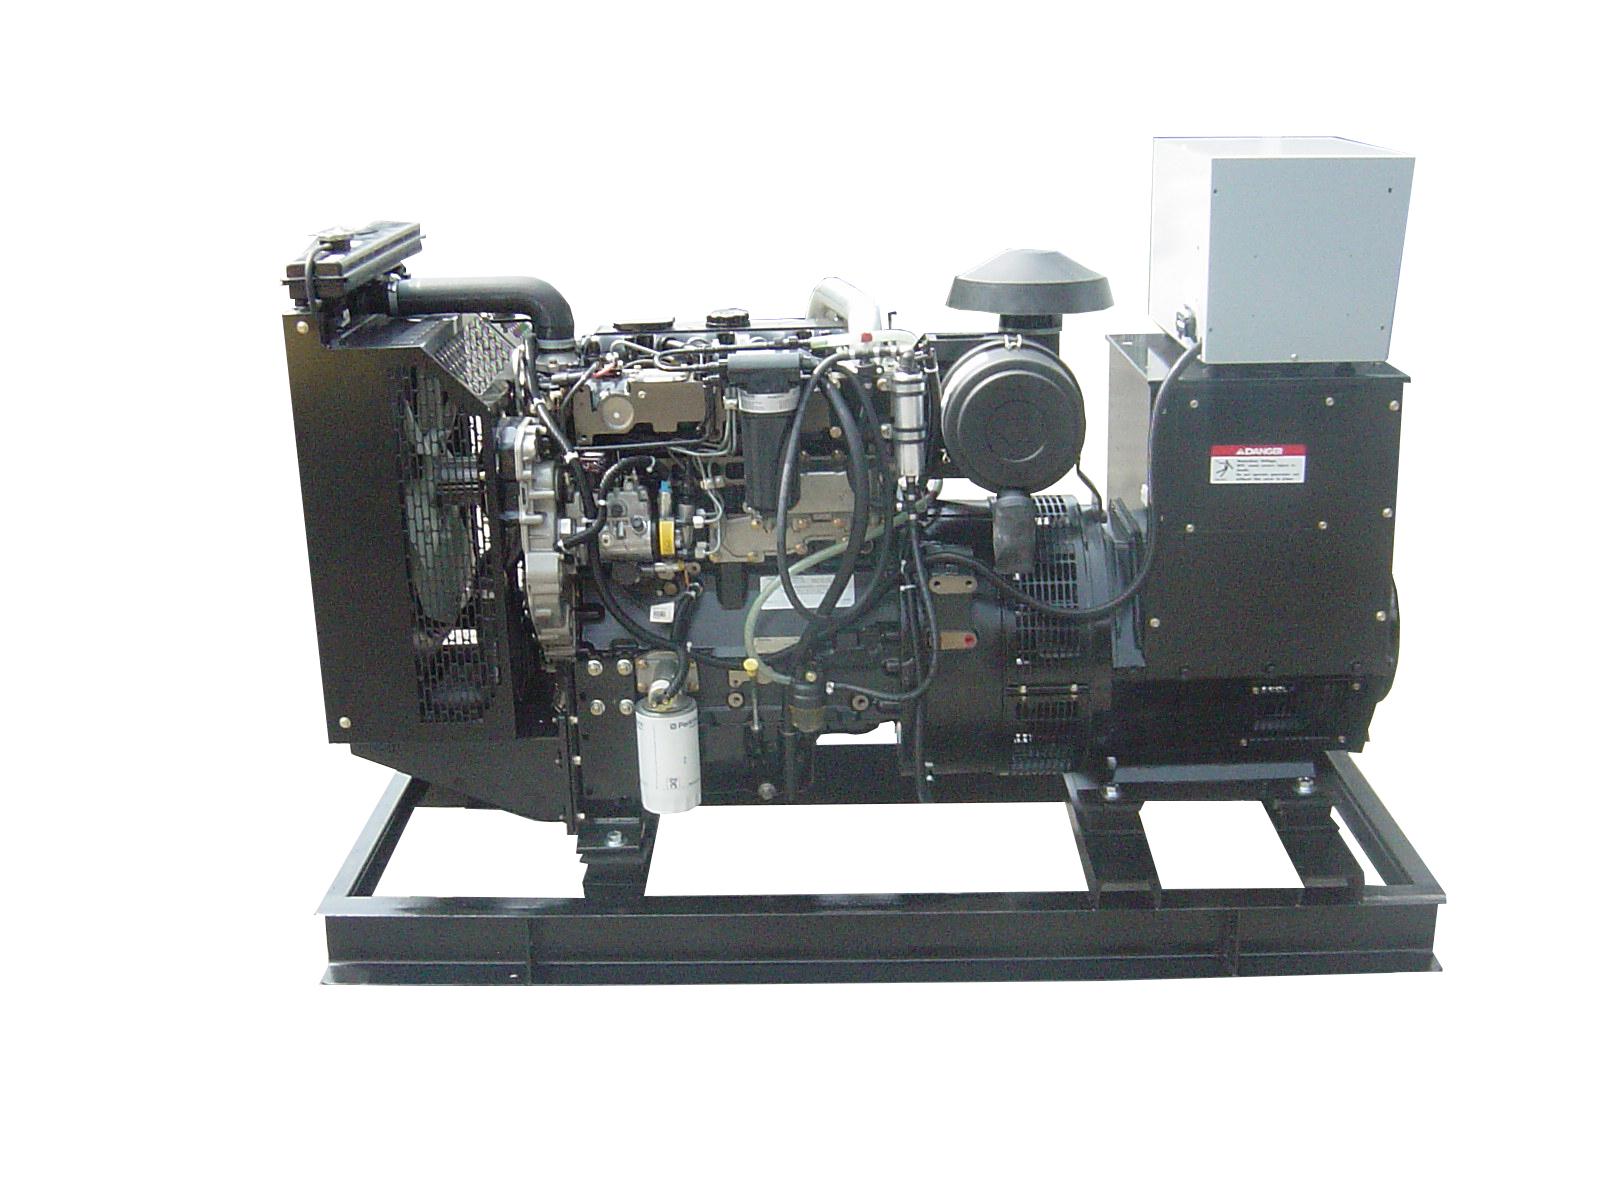 HP-50